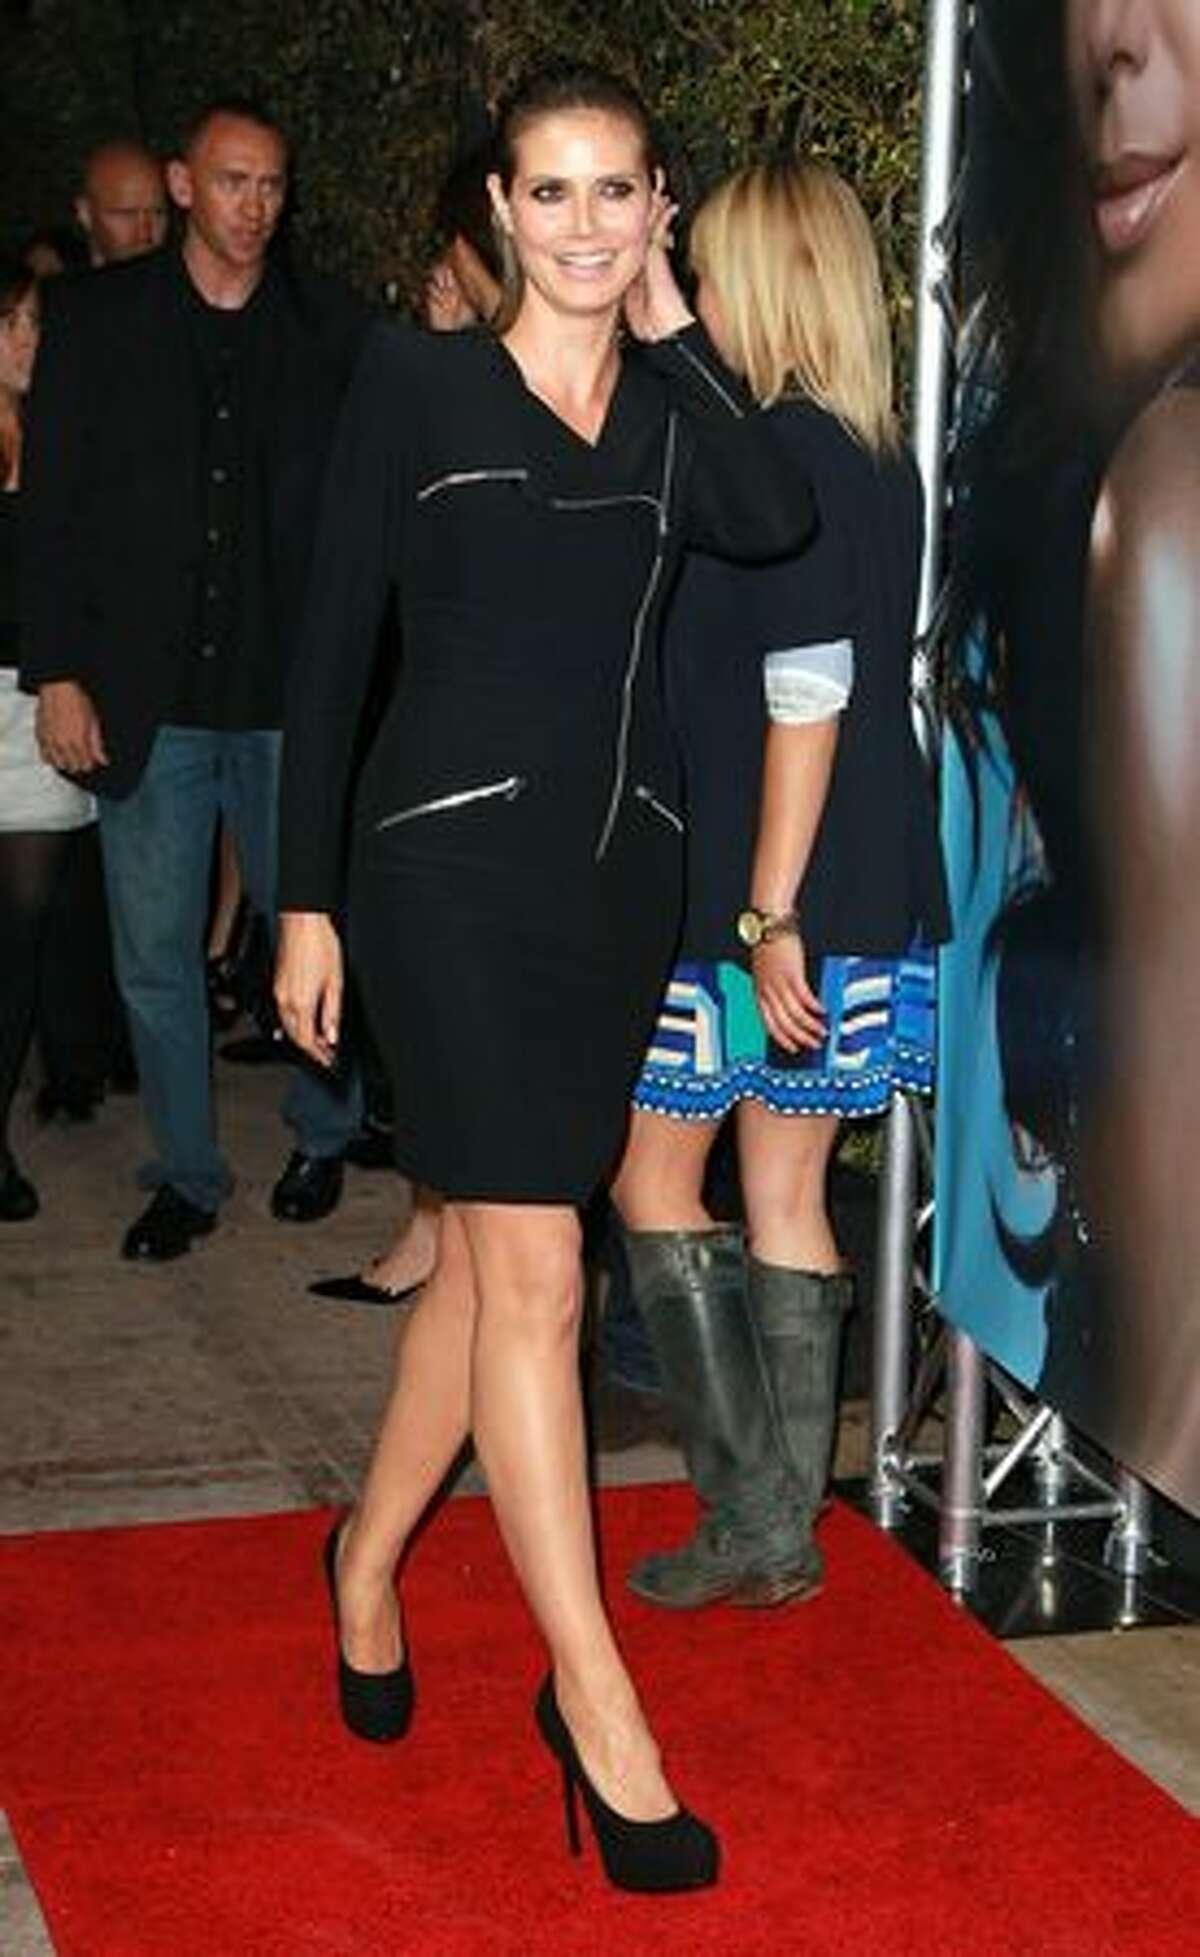 Model Heidi Klum attends the launch of Eva Longoria Parker's fragrance